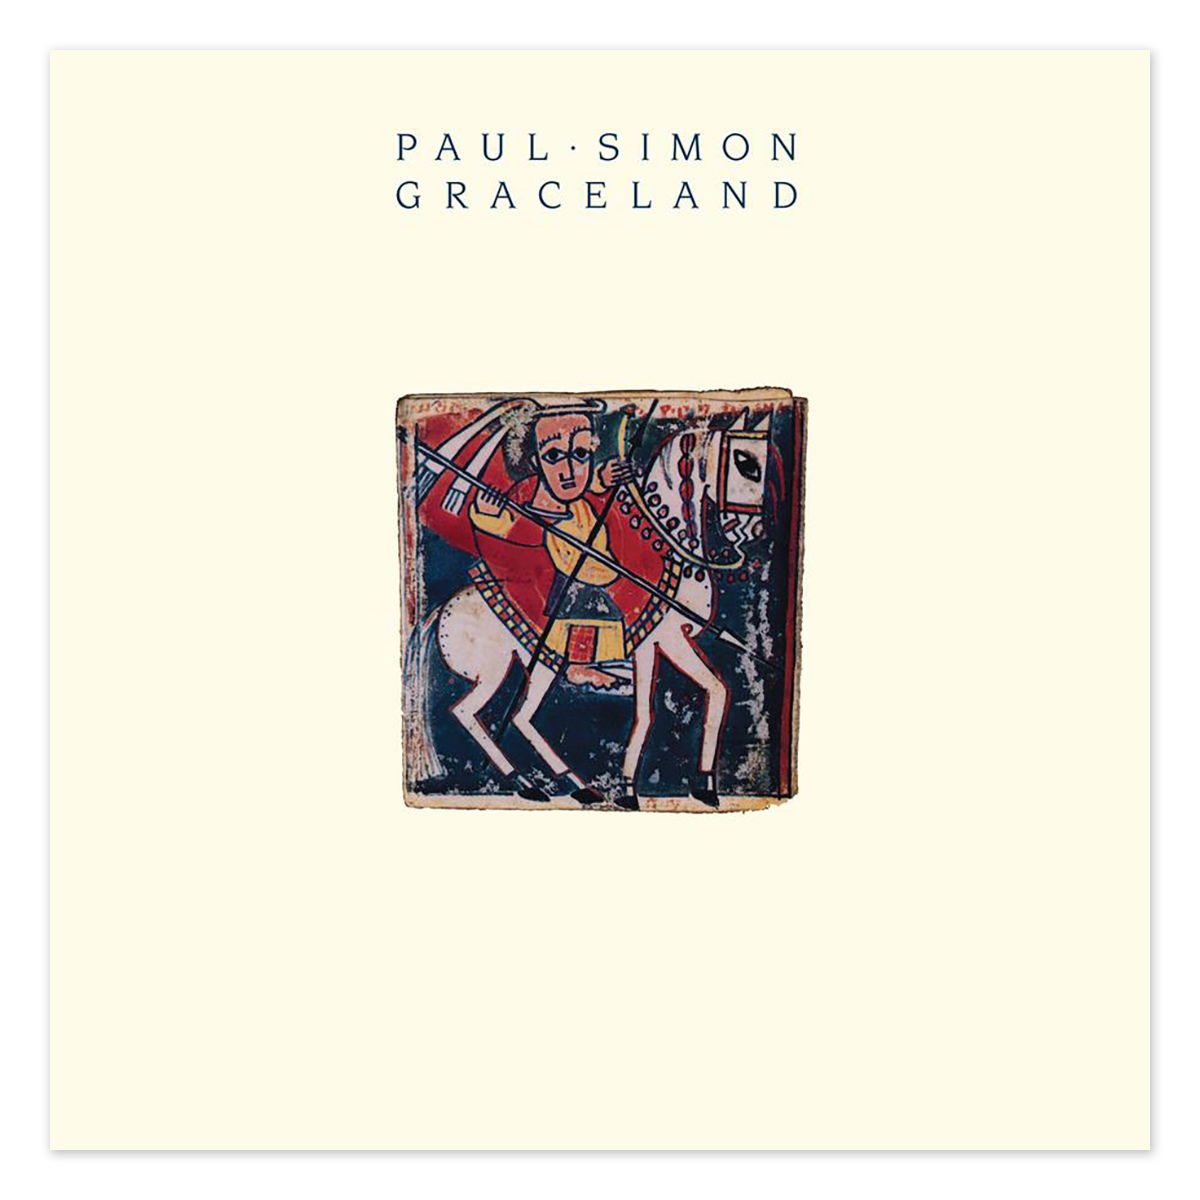 Paul Simon Graceland 25th Anniversary Edition Vinyl LP